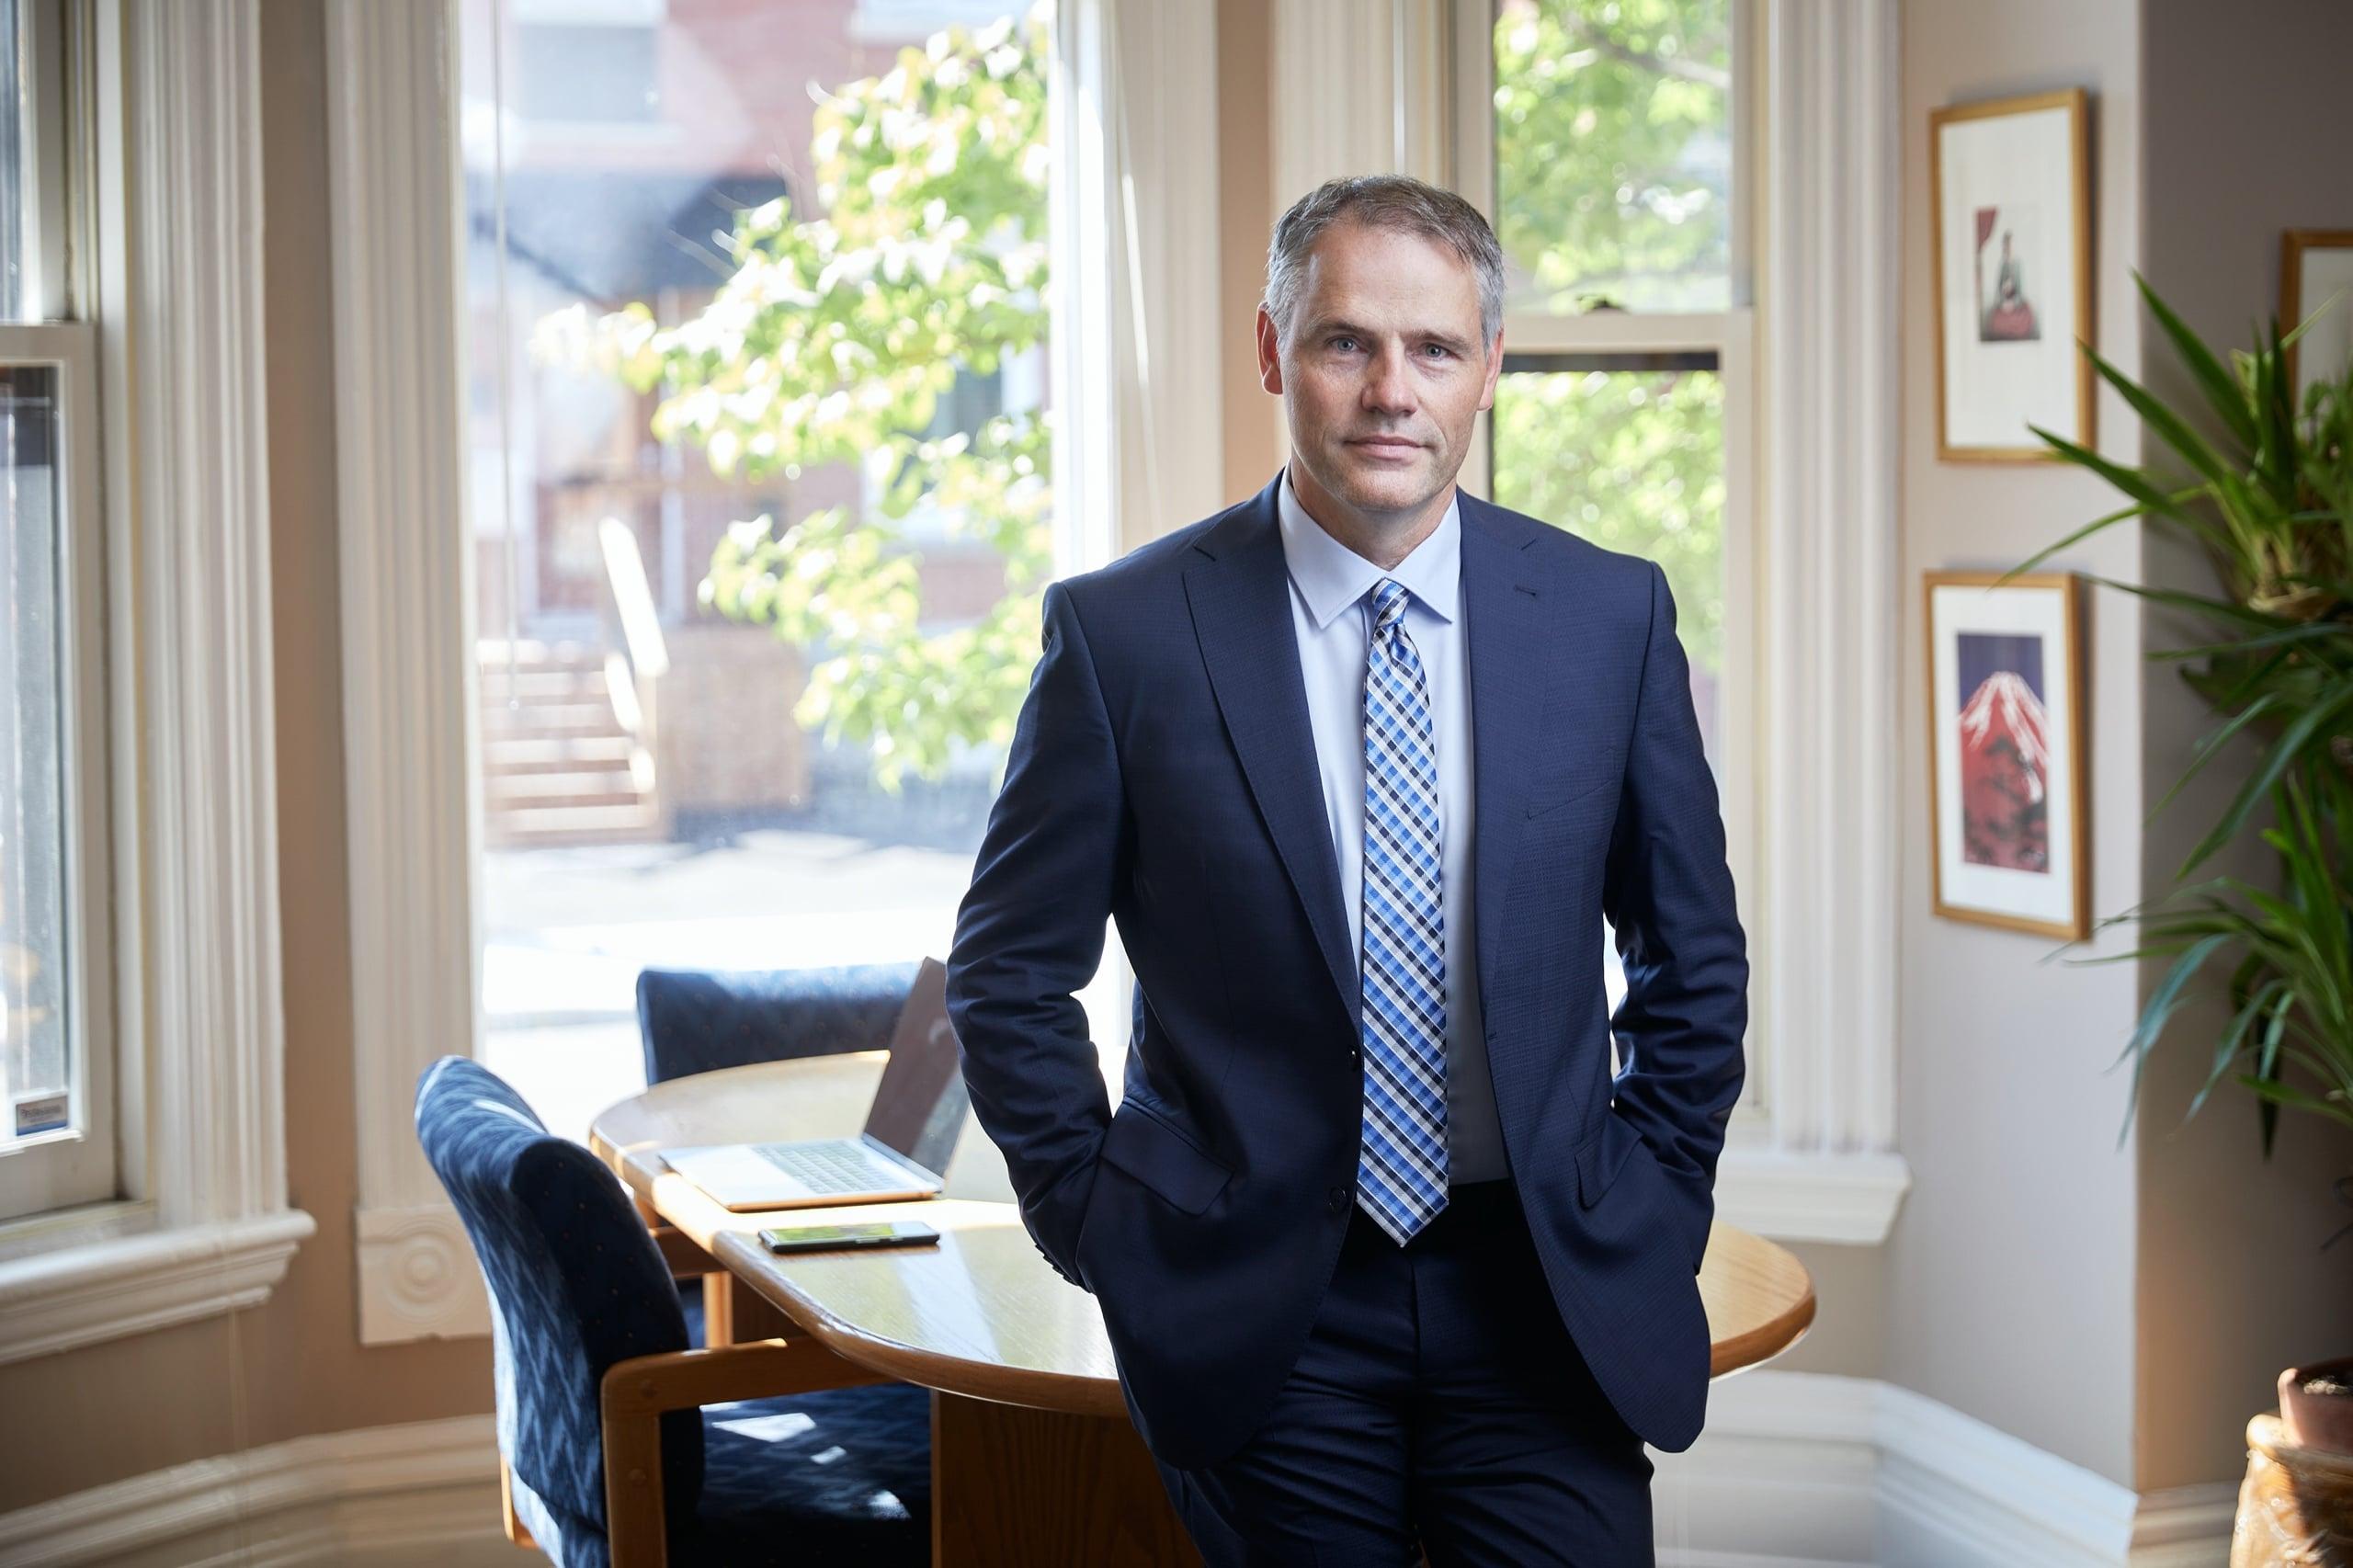 Profile picture of Paul Champ